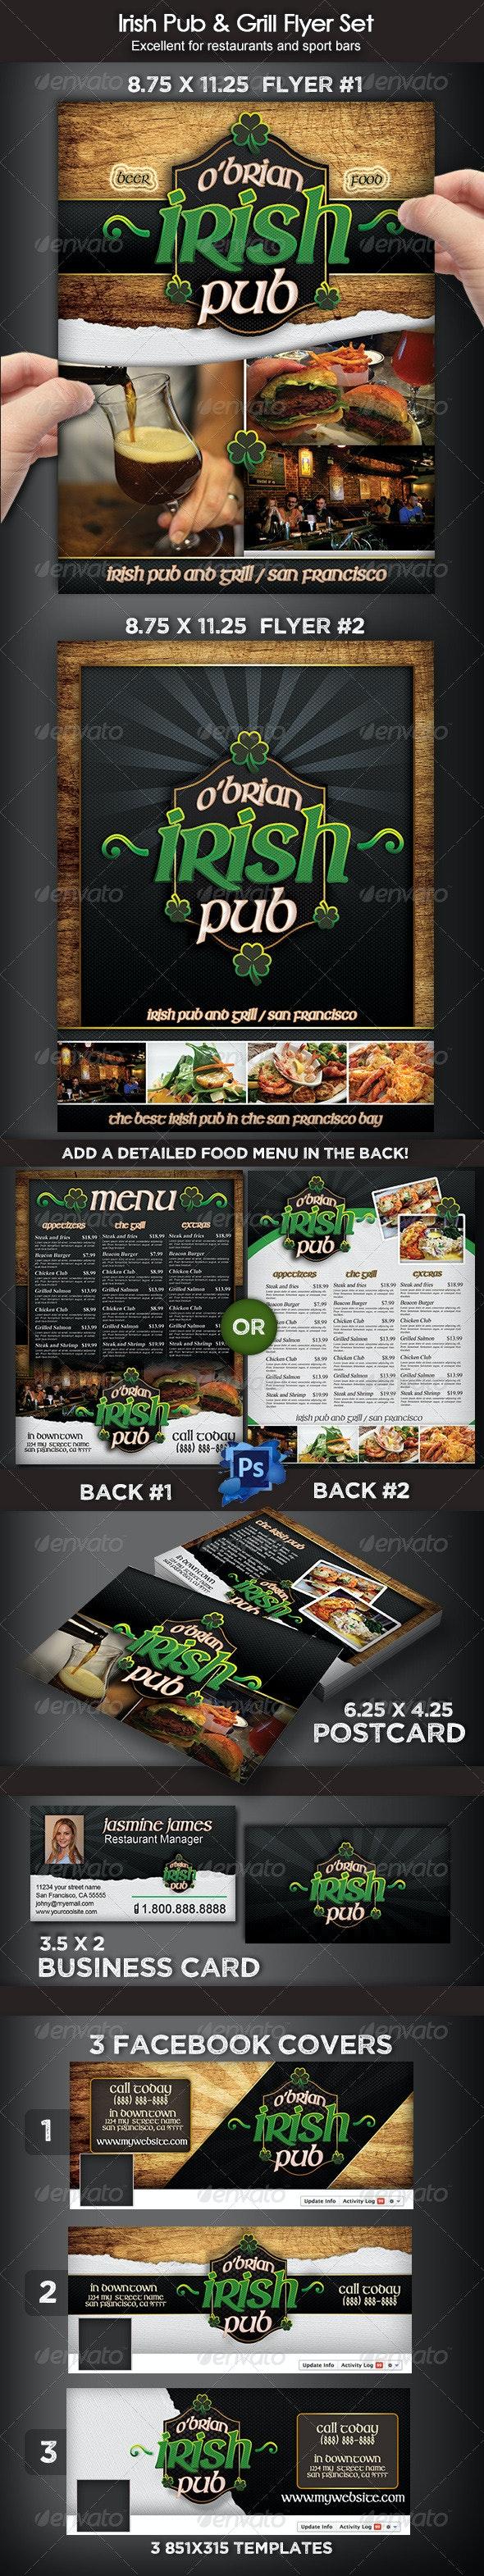 Irish Pub & Grill Flyer Set - Restaurant Flyers